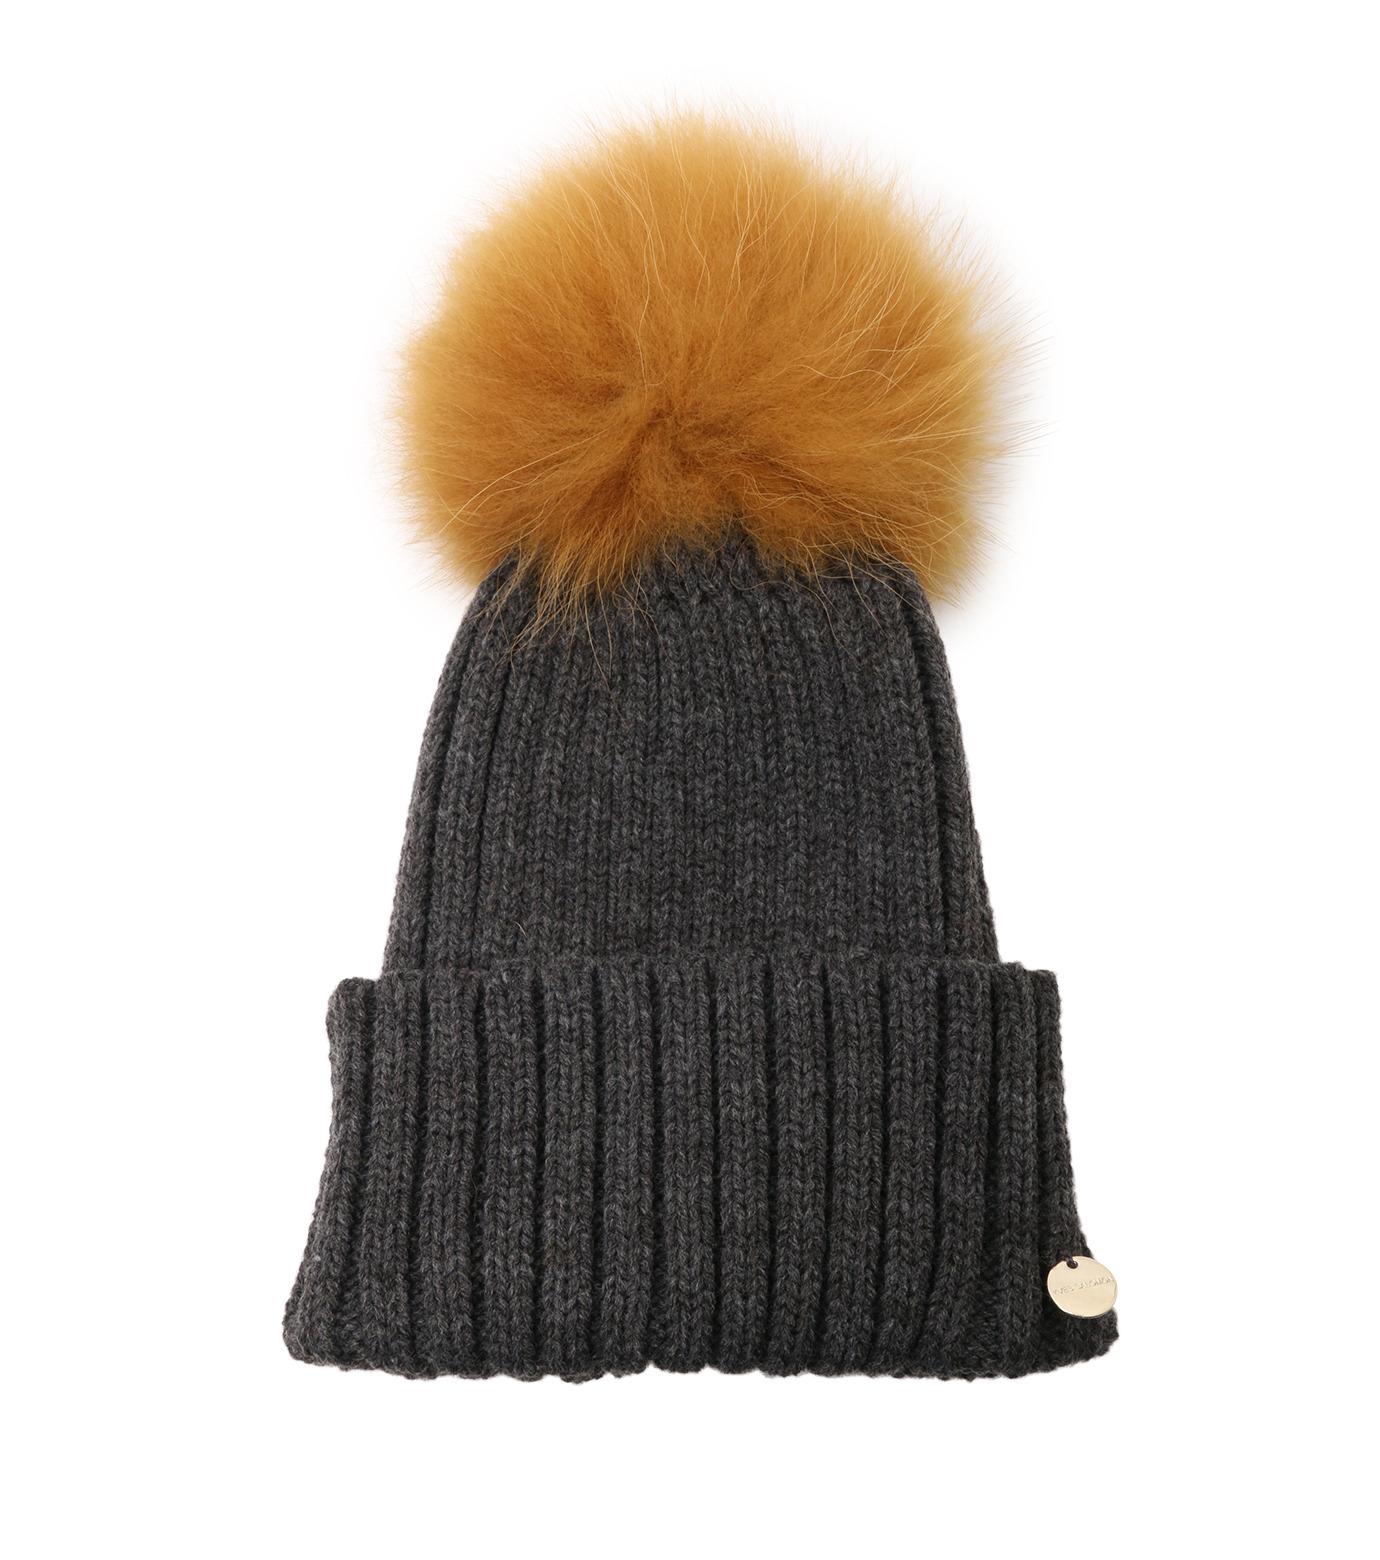 Yves Salomon(イヴ サロモン)のKnit Cap w/Marmotte Fur-YELLOW(キャップ/cap)-Y5982XXFCA-32 拡大詳細画像1